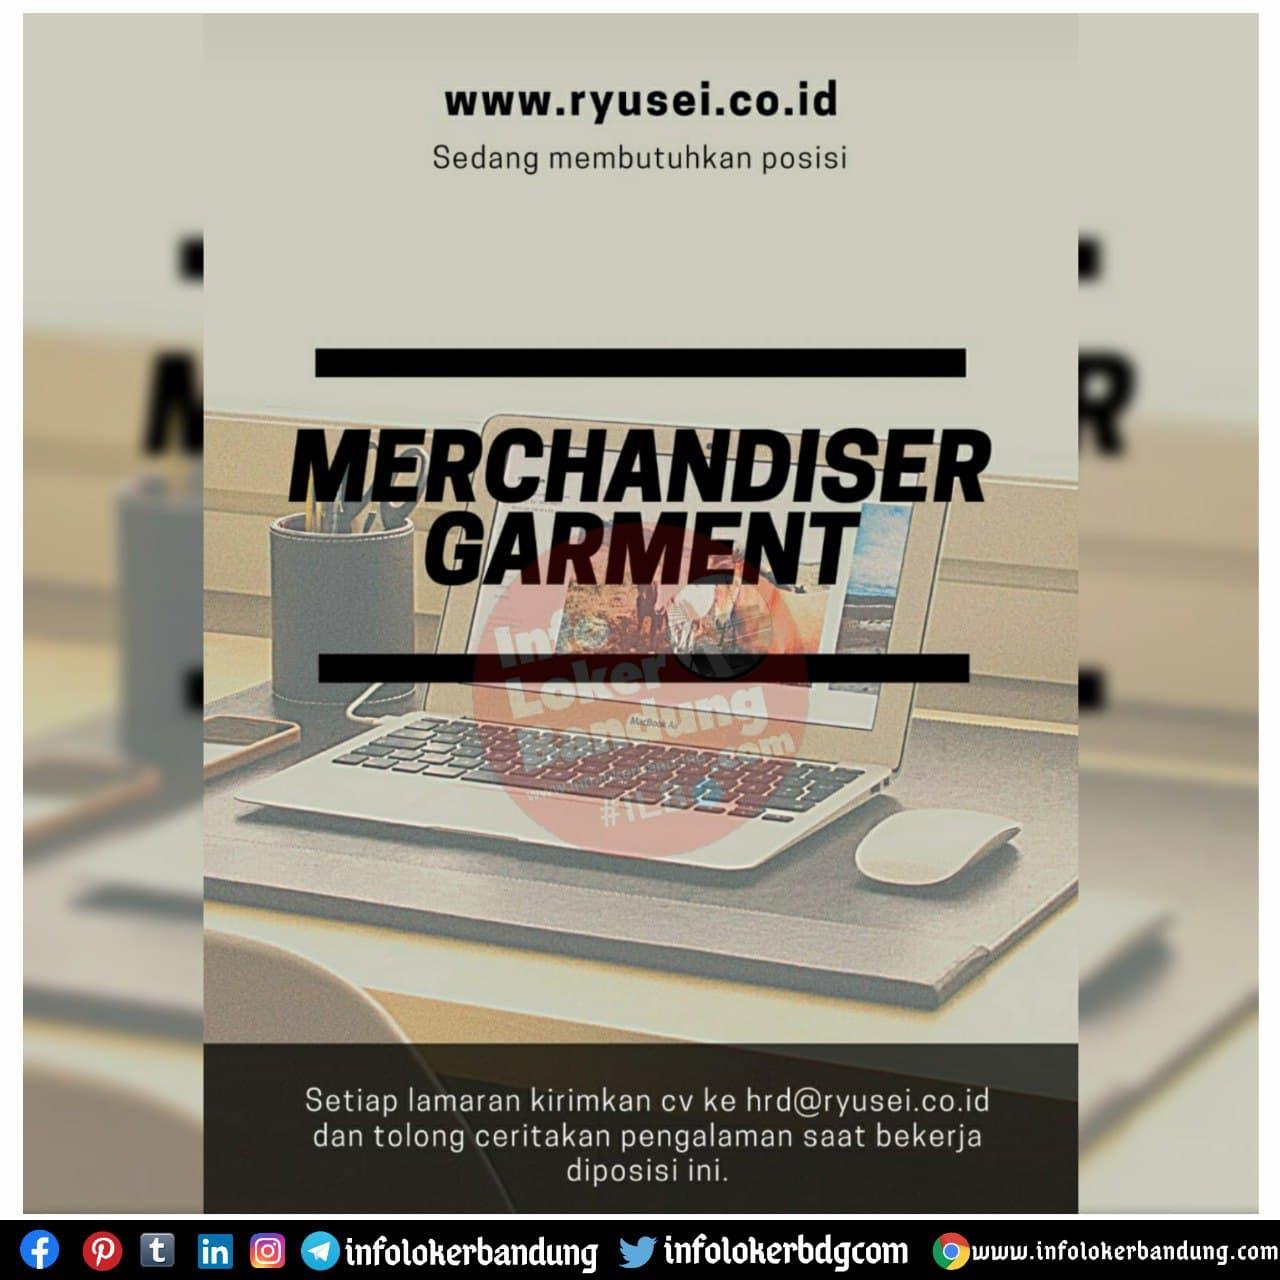 Lowongan Kerja Merchandiser Garment Ryusei Bandung November 2020